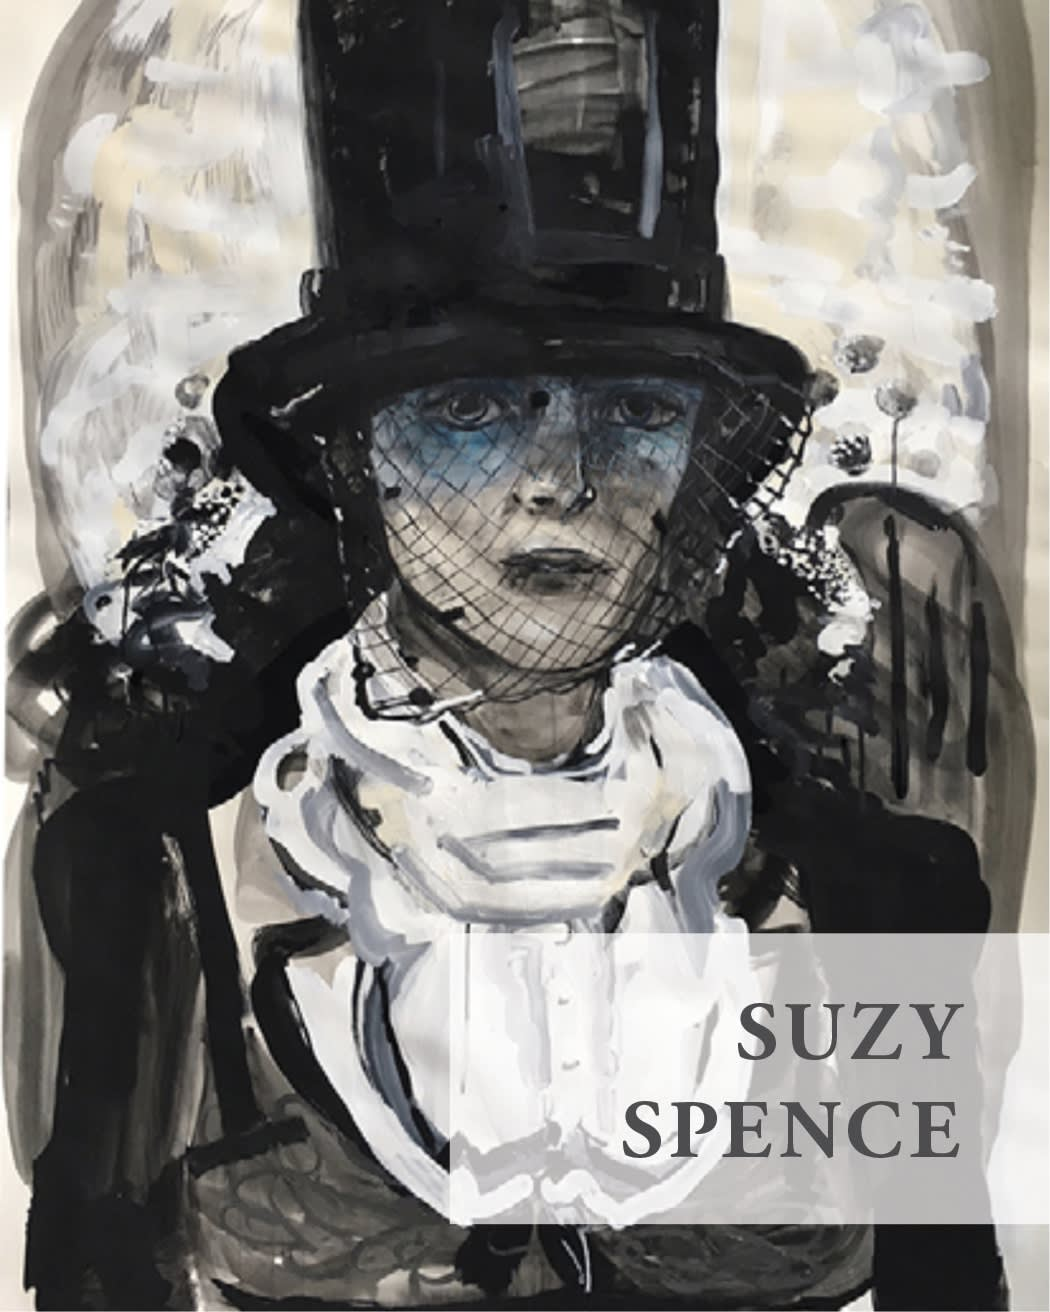 Suzy Spence